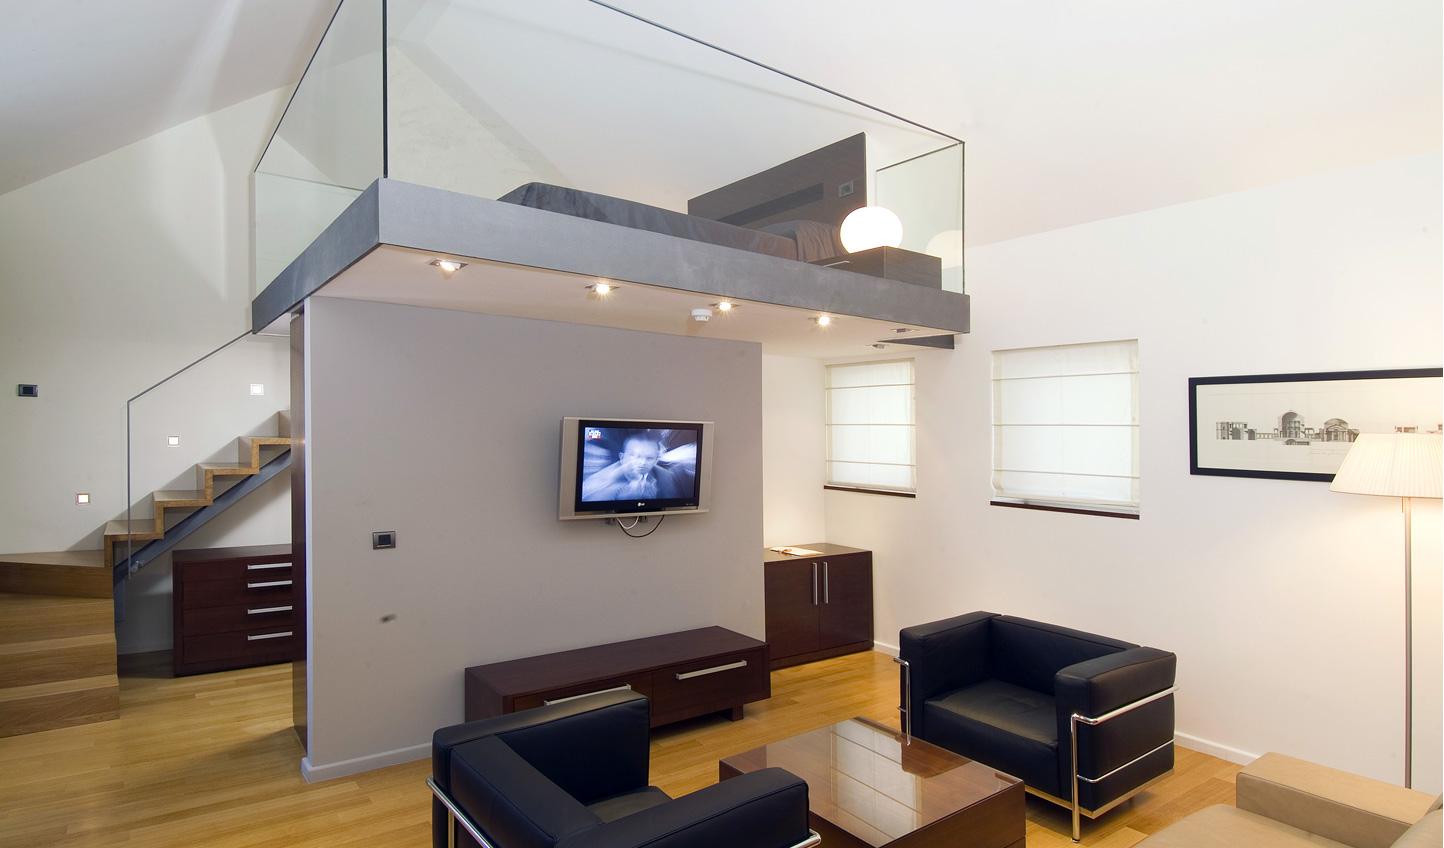 Ultra-lux bedroom interiors